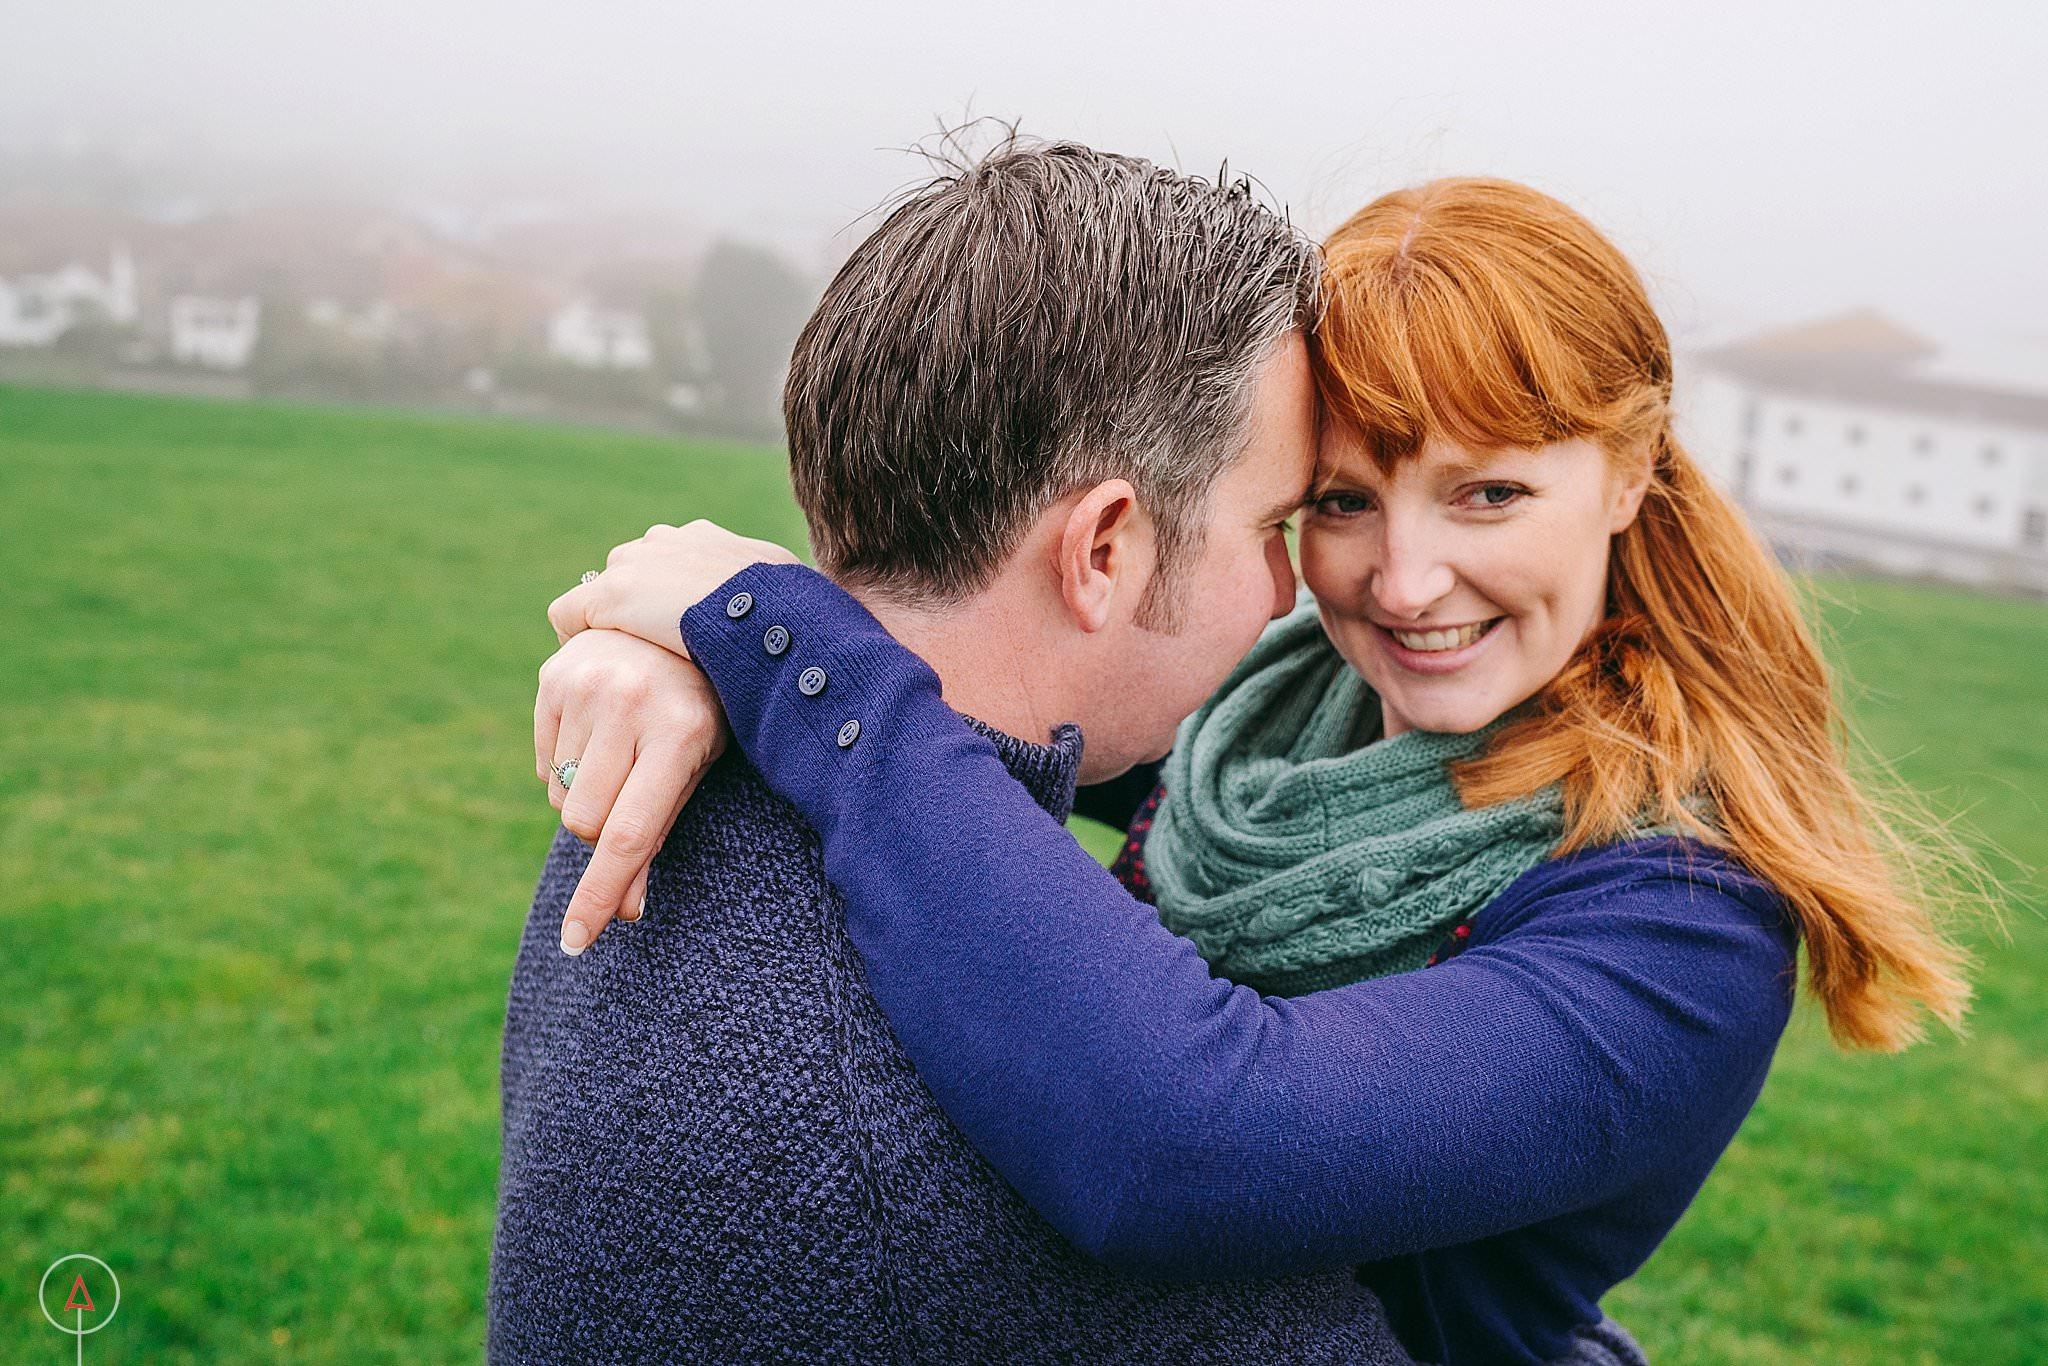 South-Wales-Pre-Wedding-Photography-Aga-Tomaszek-00030